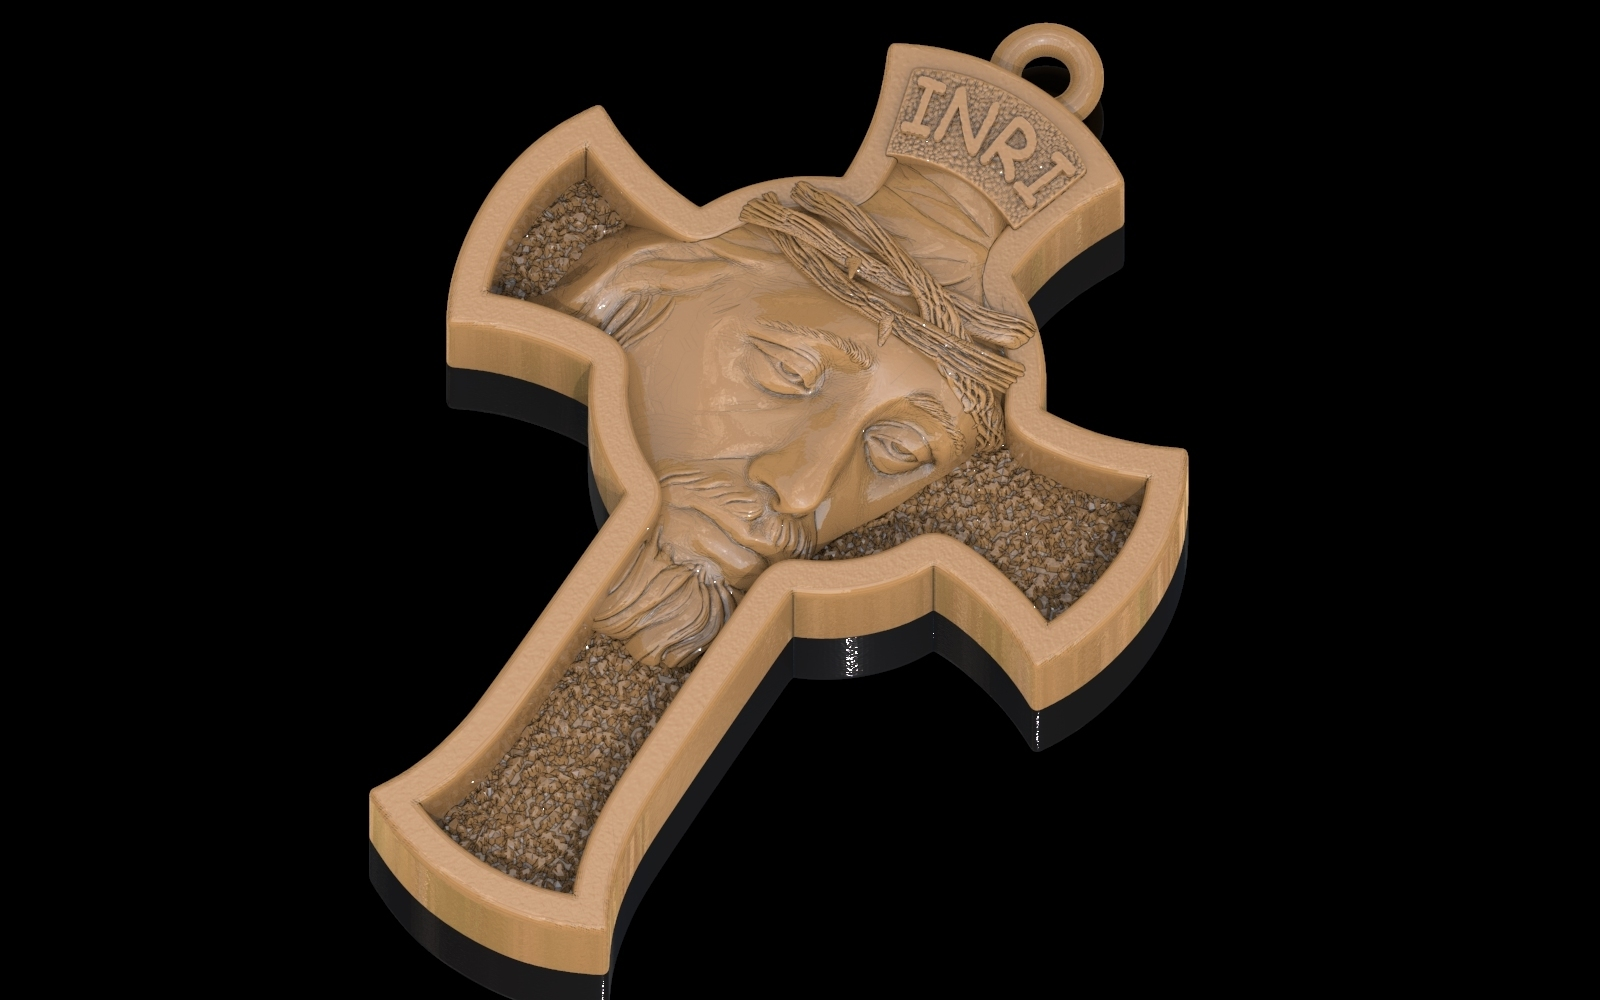 3.jpg Download free STL file Jesus Cross pendant medallion jewelry 3D print model • 3D printable object, Cadagency